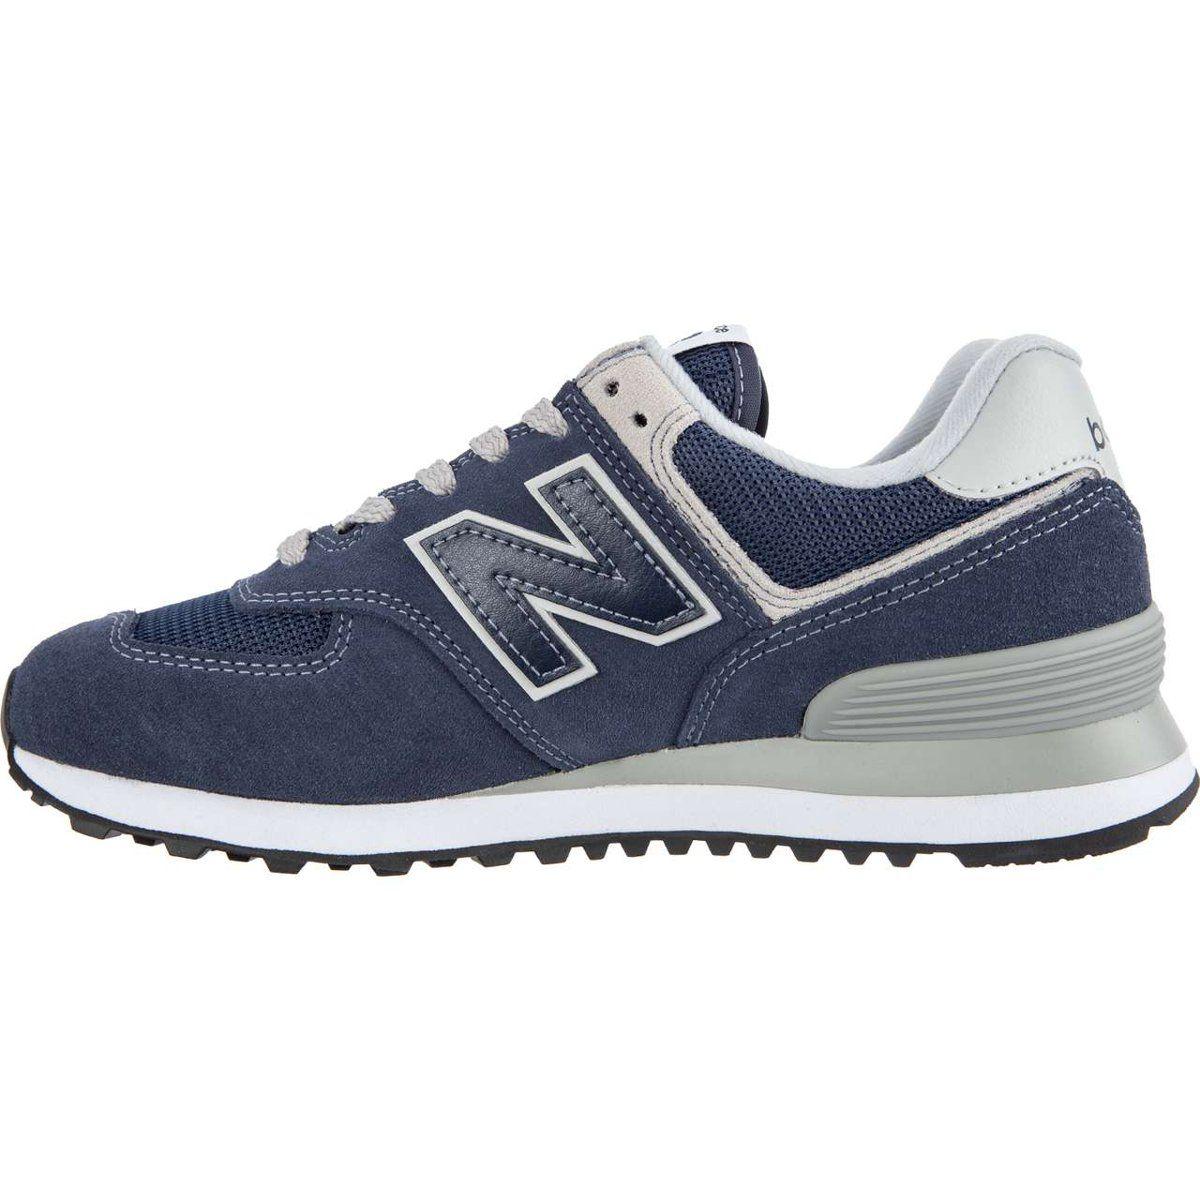 Sportowe Damskie Newbalance New Balance Granatowe Wl574en Navy With White New Balance Shoes New Balance Balance